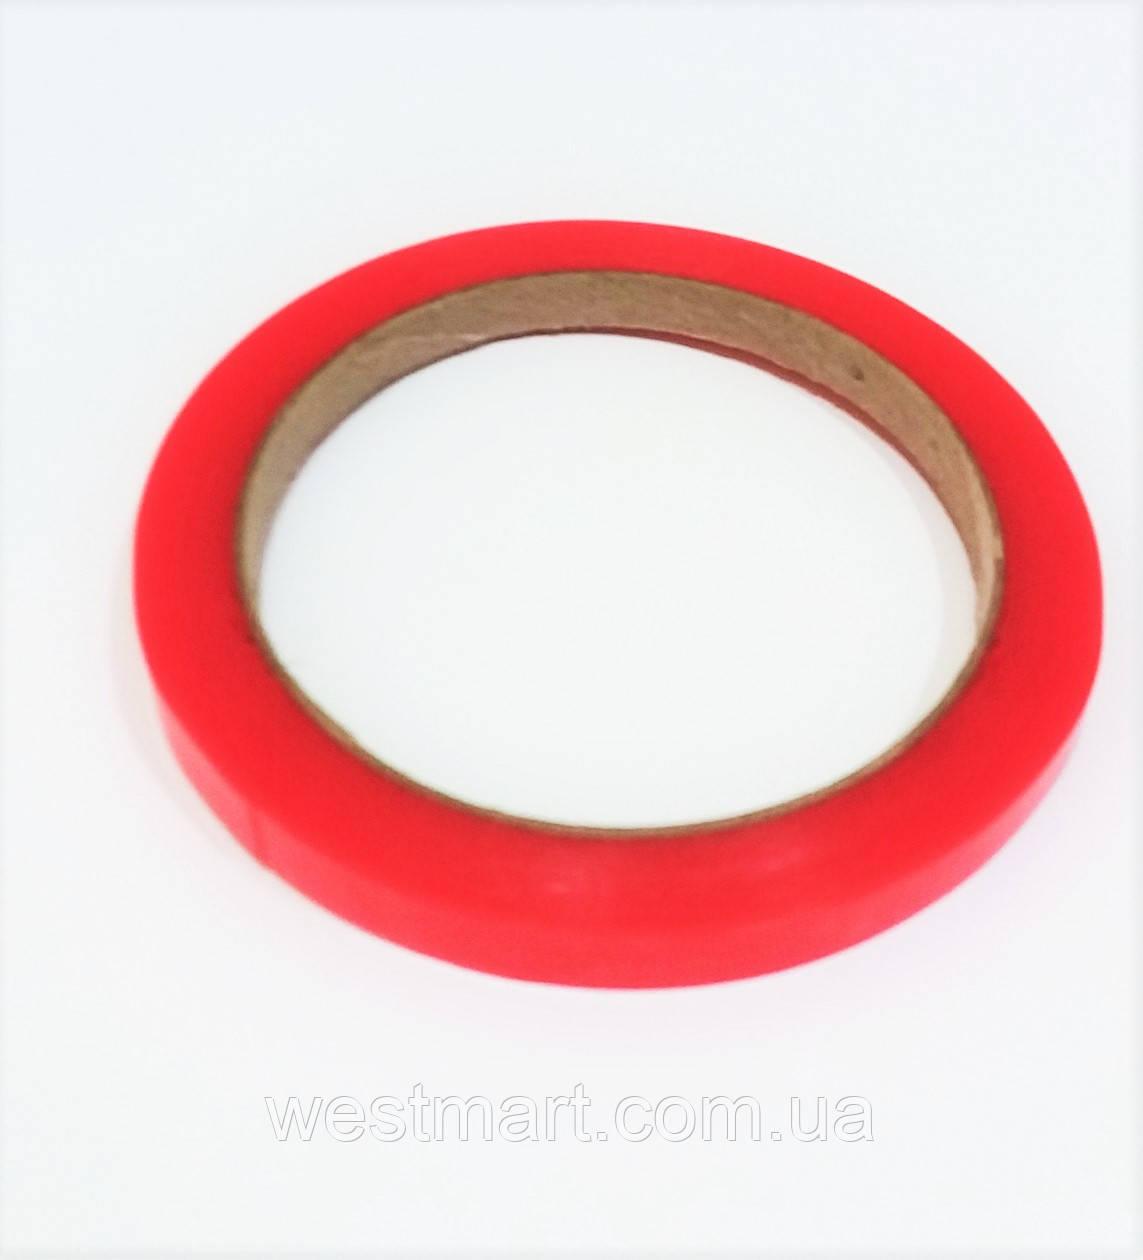 Тонкая двусторонняя клейкая лента MP350R 6мм (скотч)